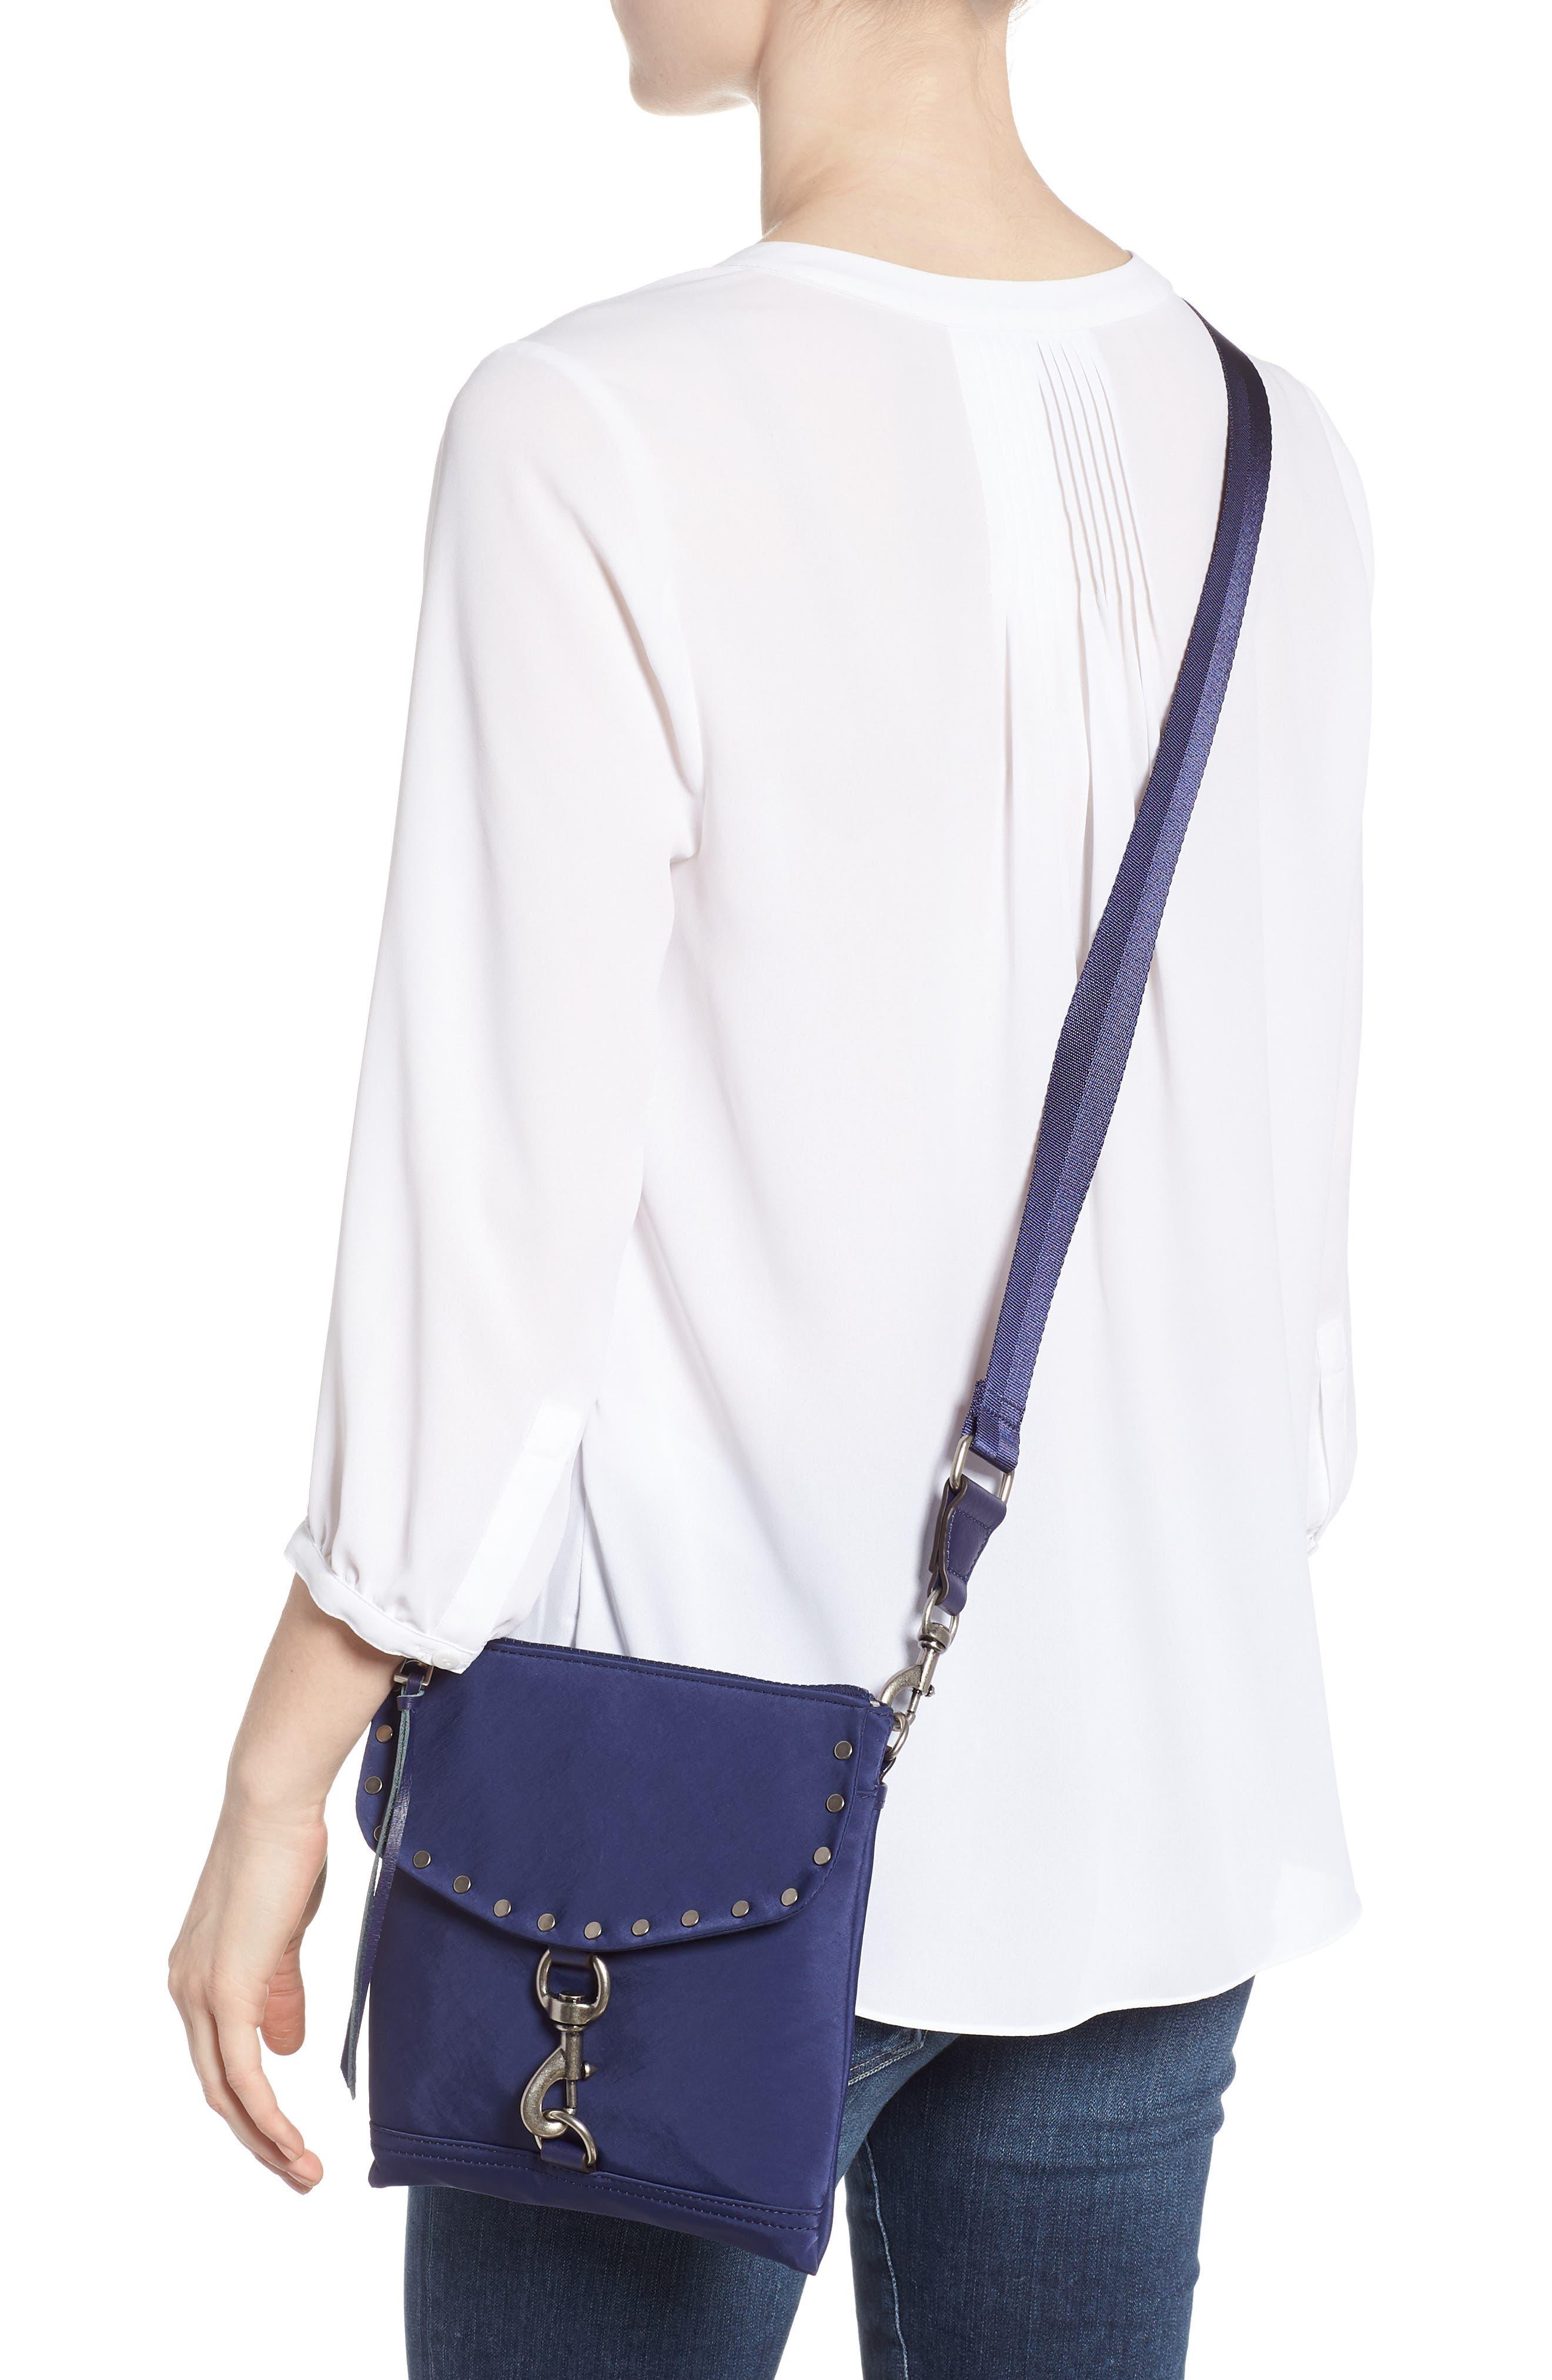 Nylon Flap Crossbody Bag,                             Alternate thumbnail 2, color,                             True Navy